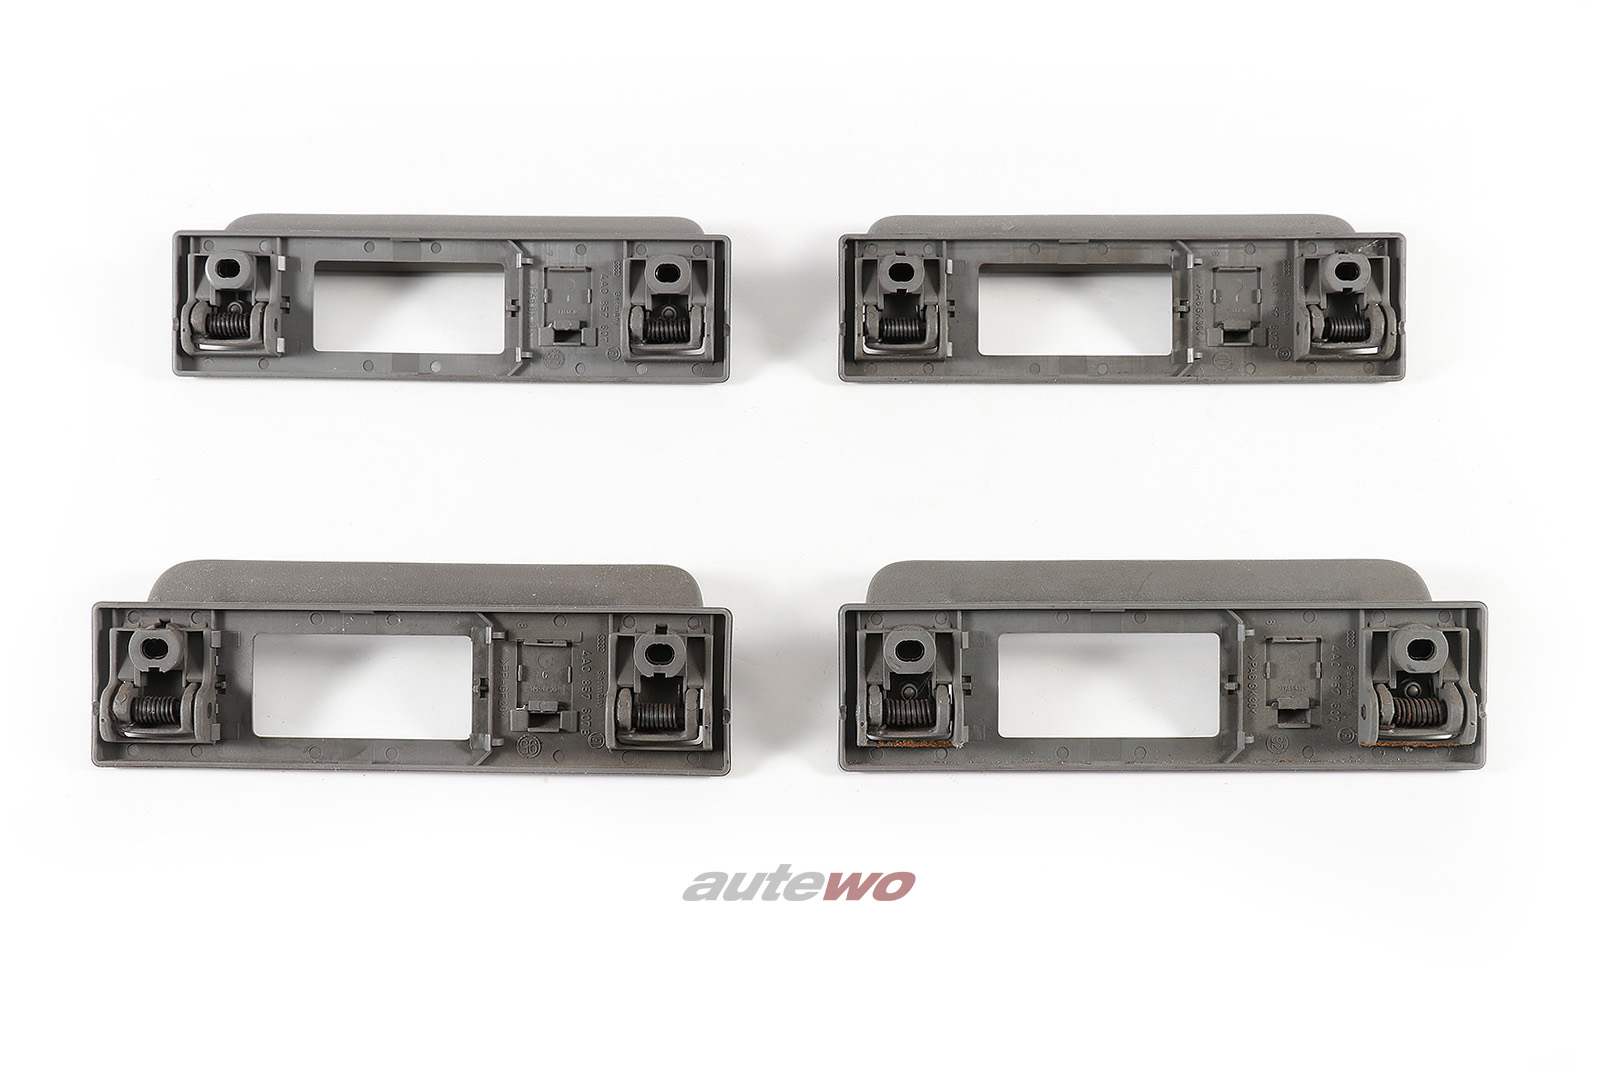 4A0857607 4A0857607B Audi 80 B4/Coupe Typ 89/100/A6 C4/V8 D11 Set Haltegriffe